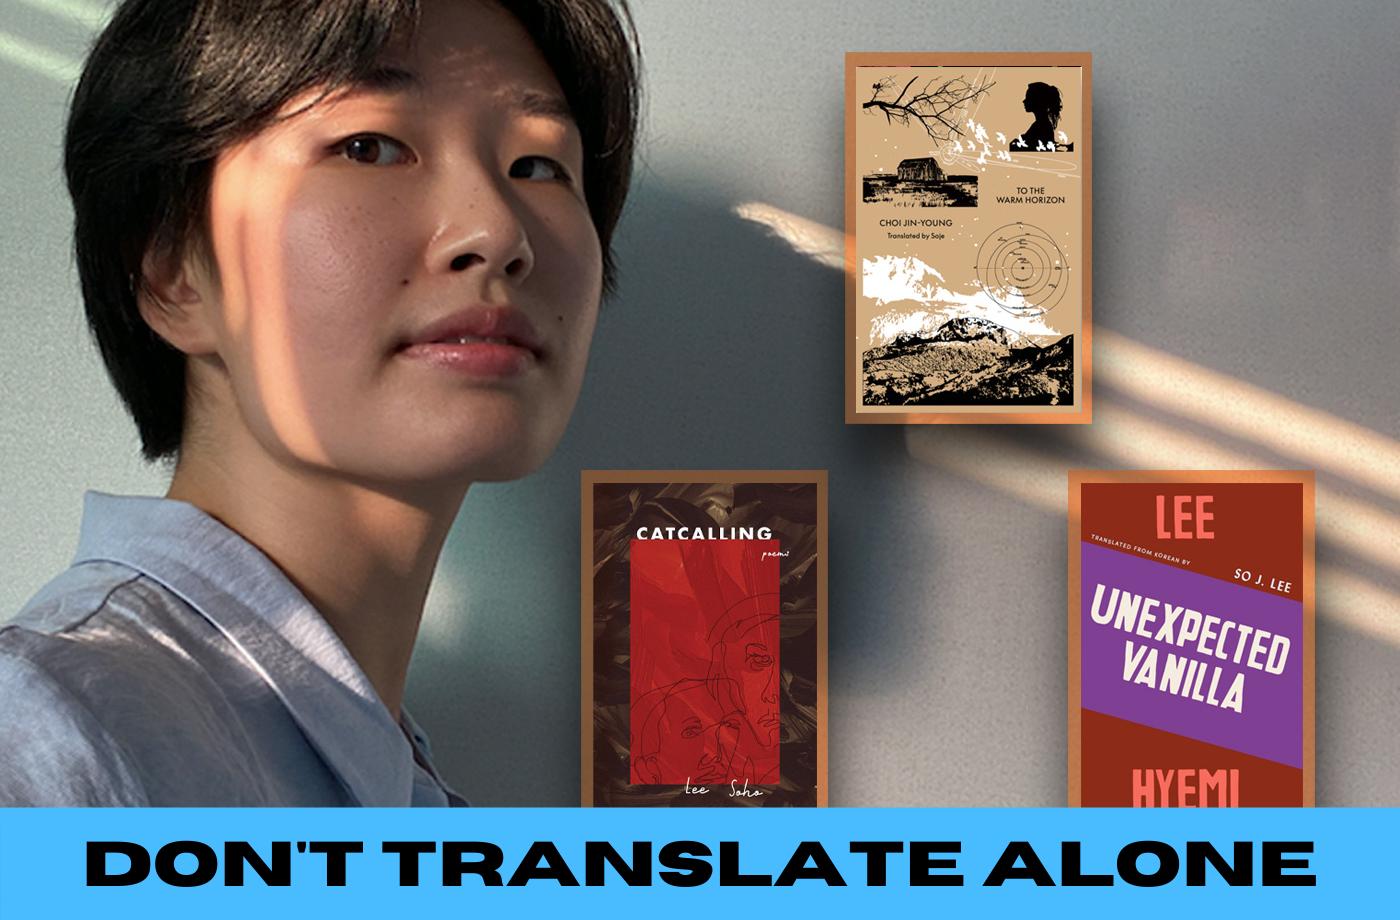 Catapult online classes: Soje ., 2-Day Online Translation Intensive: Translating Shape & Meaning in Concrete Poetry, Poetry, Translation, Intensive